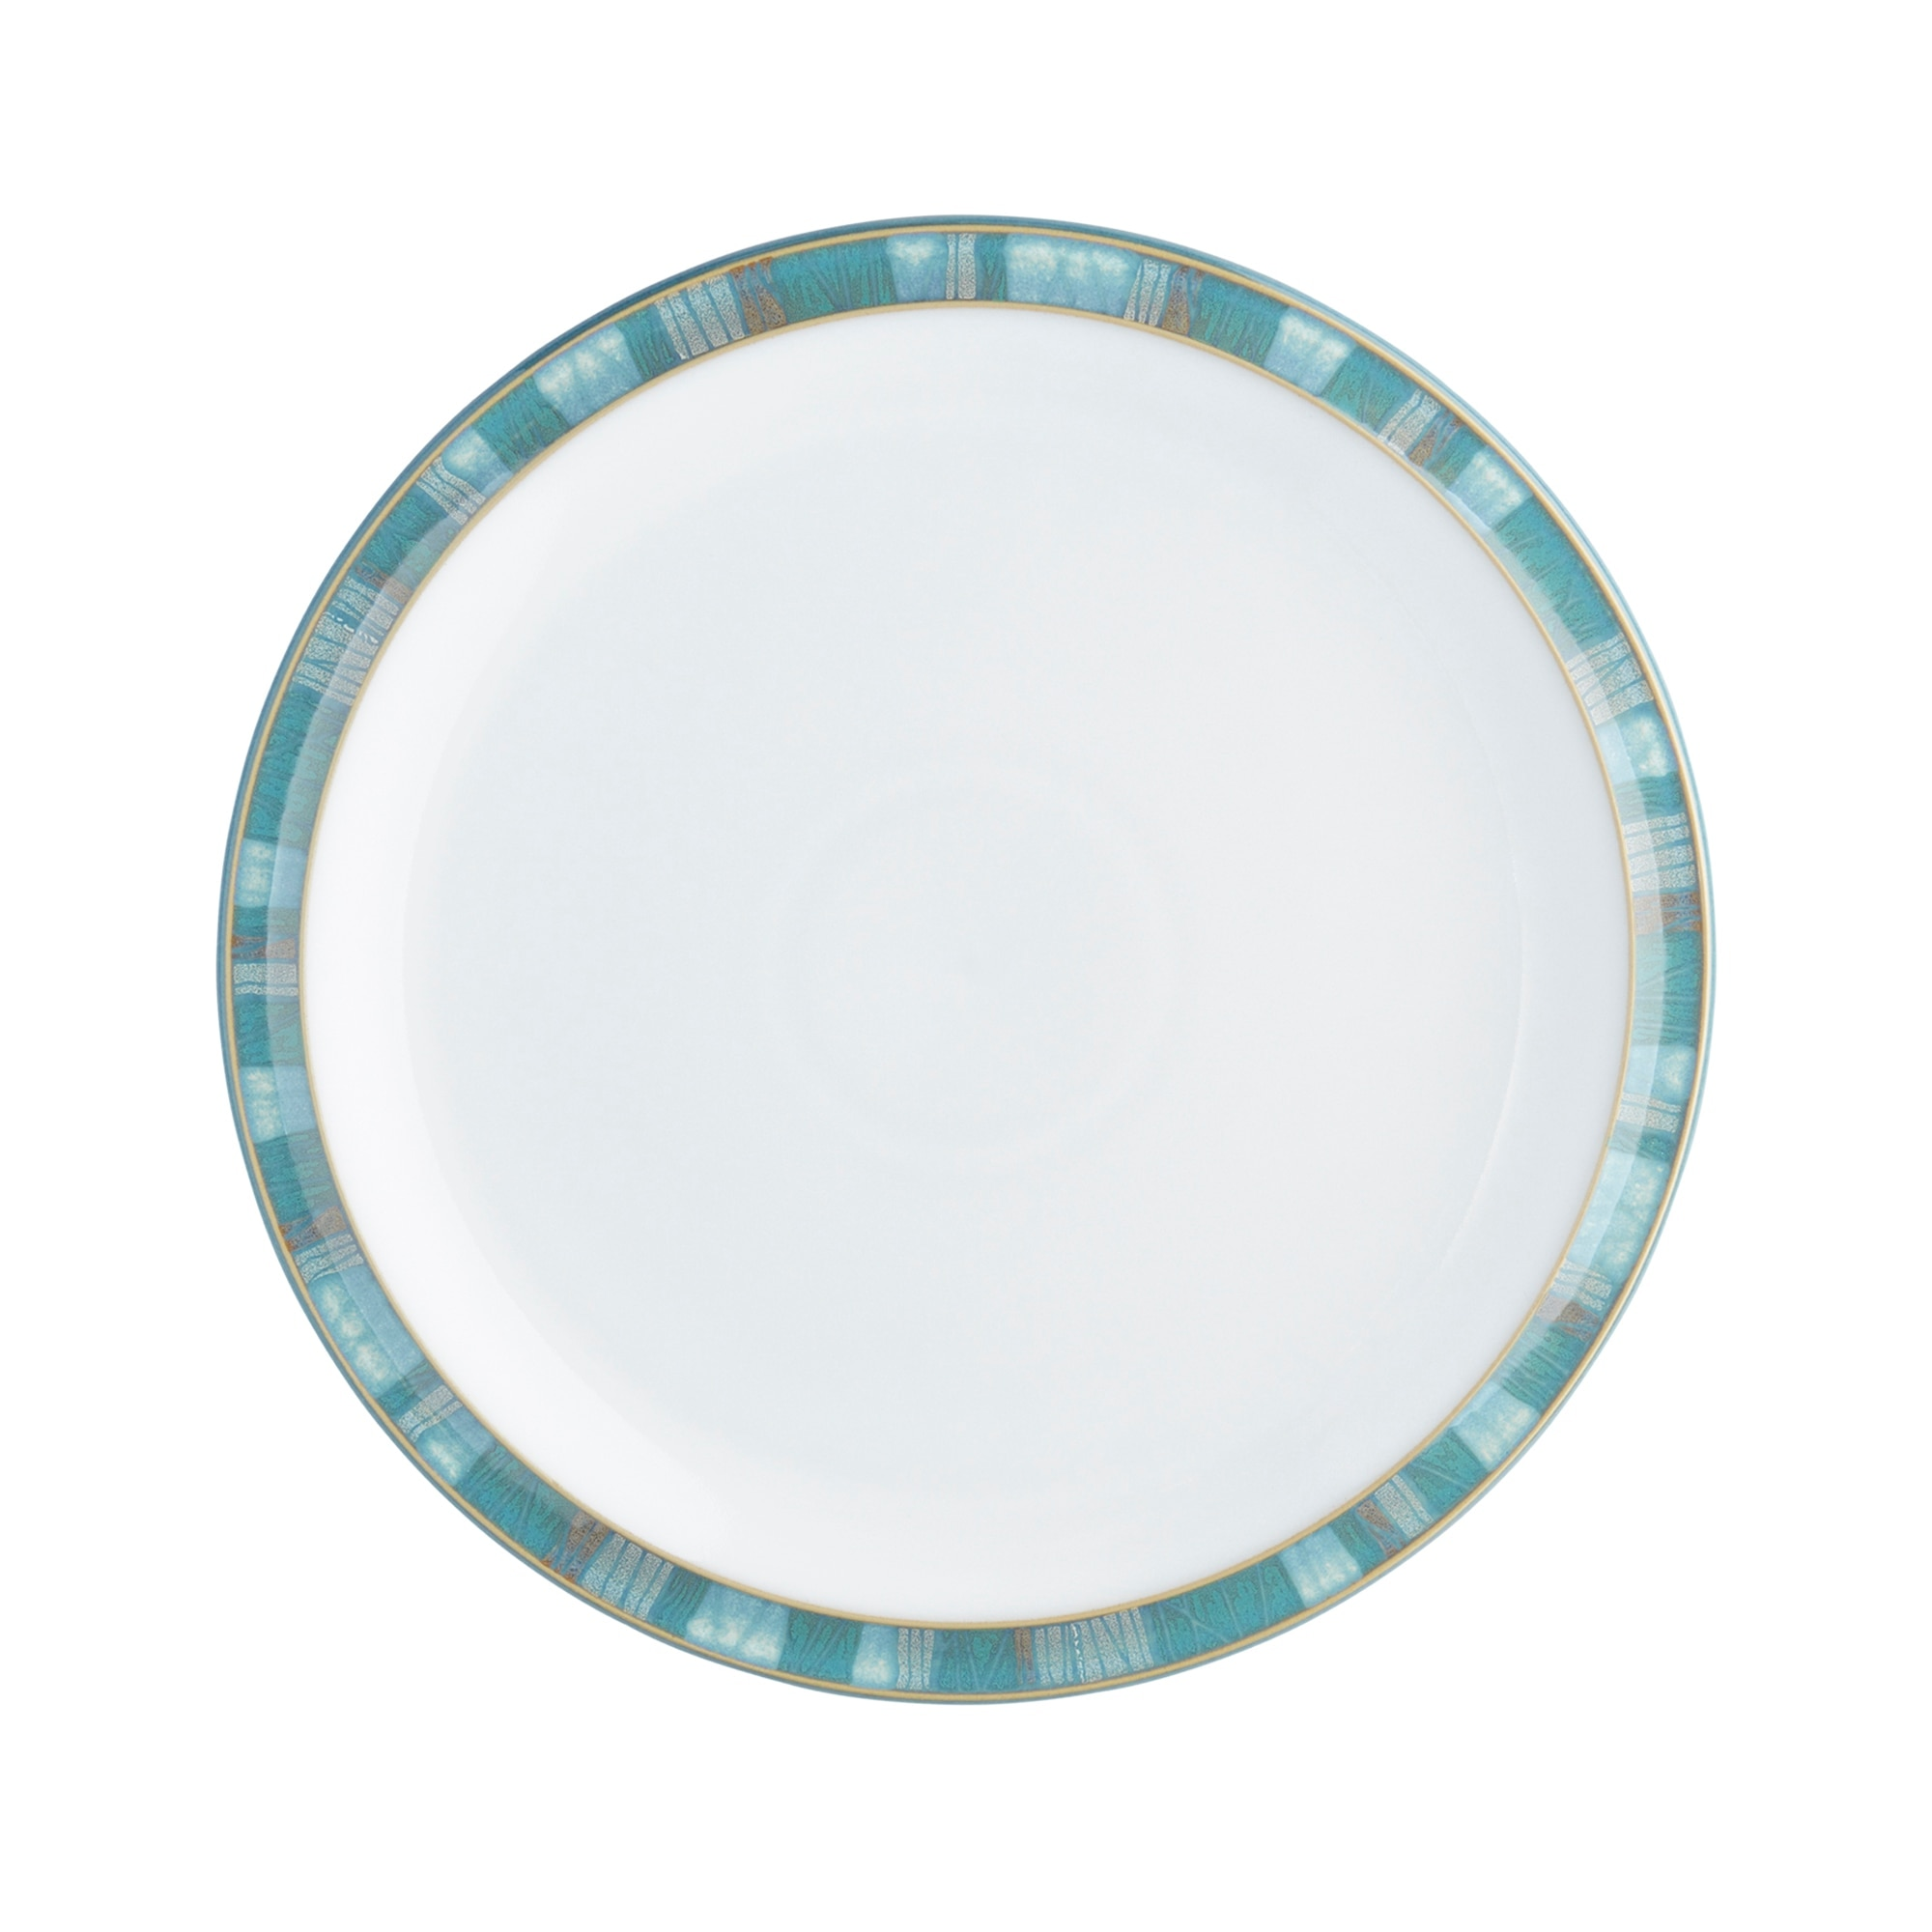 Compare prices for Denby Azure Coast Medium Plate